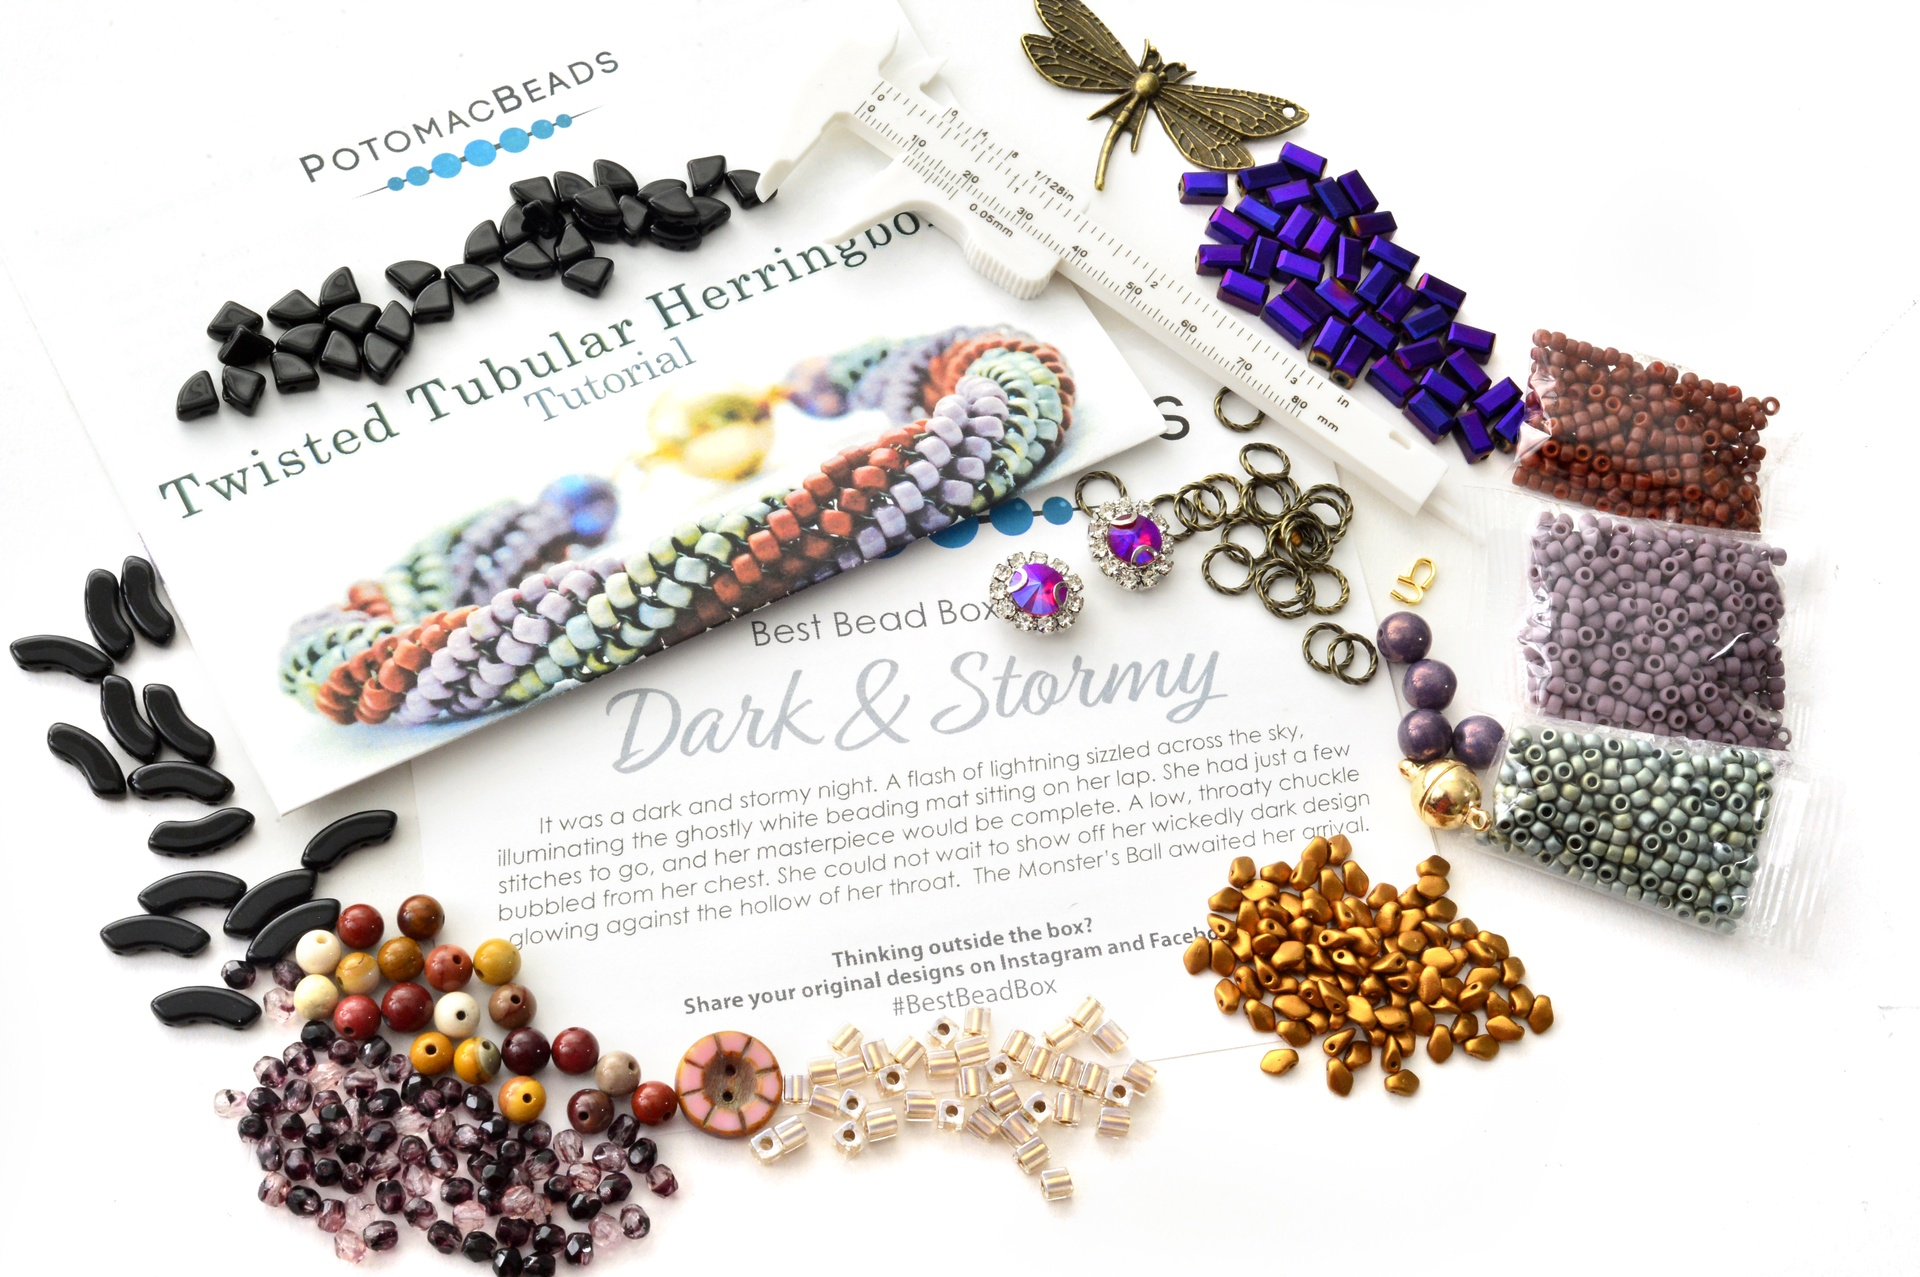 Subscription Inspiration / Best Bead Box October 2020